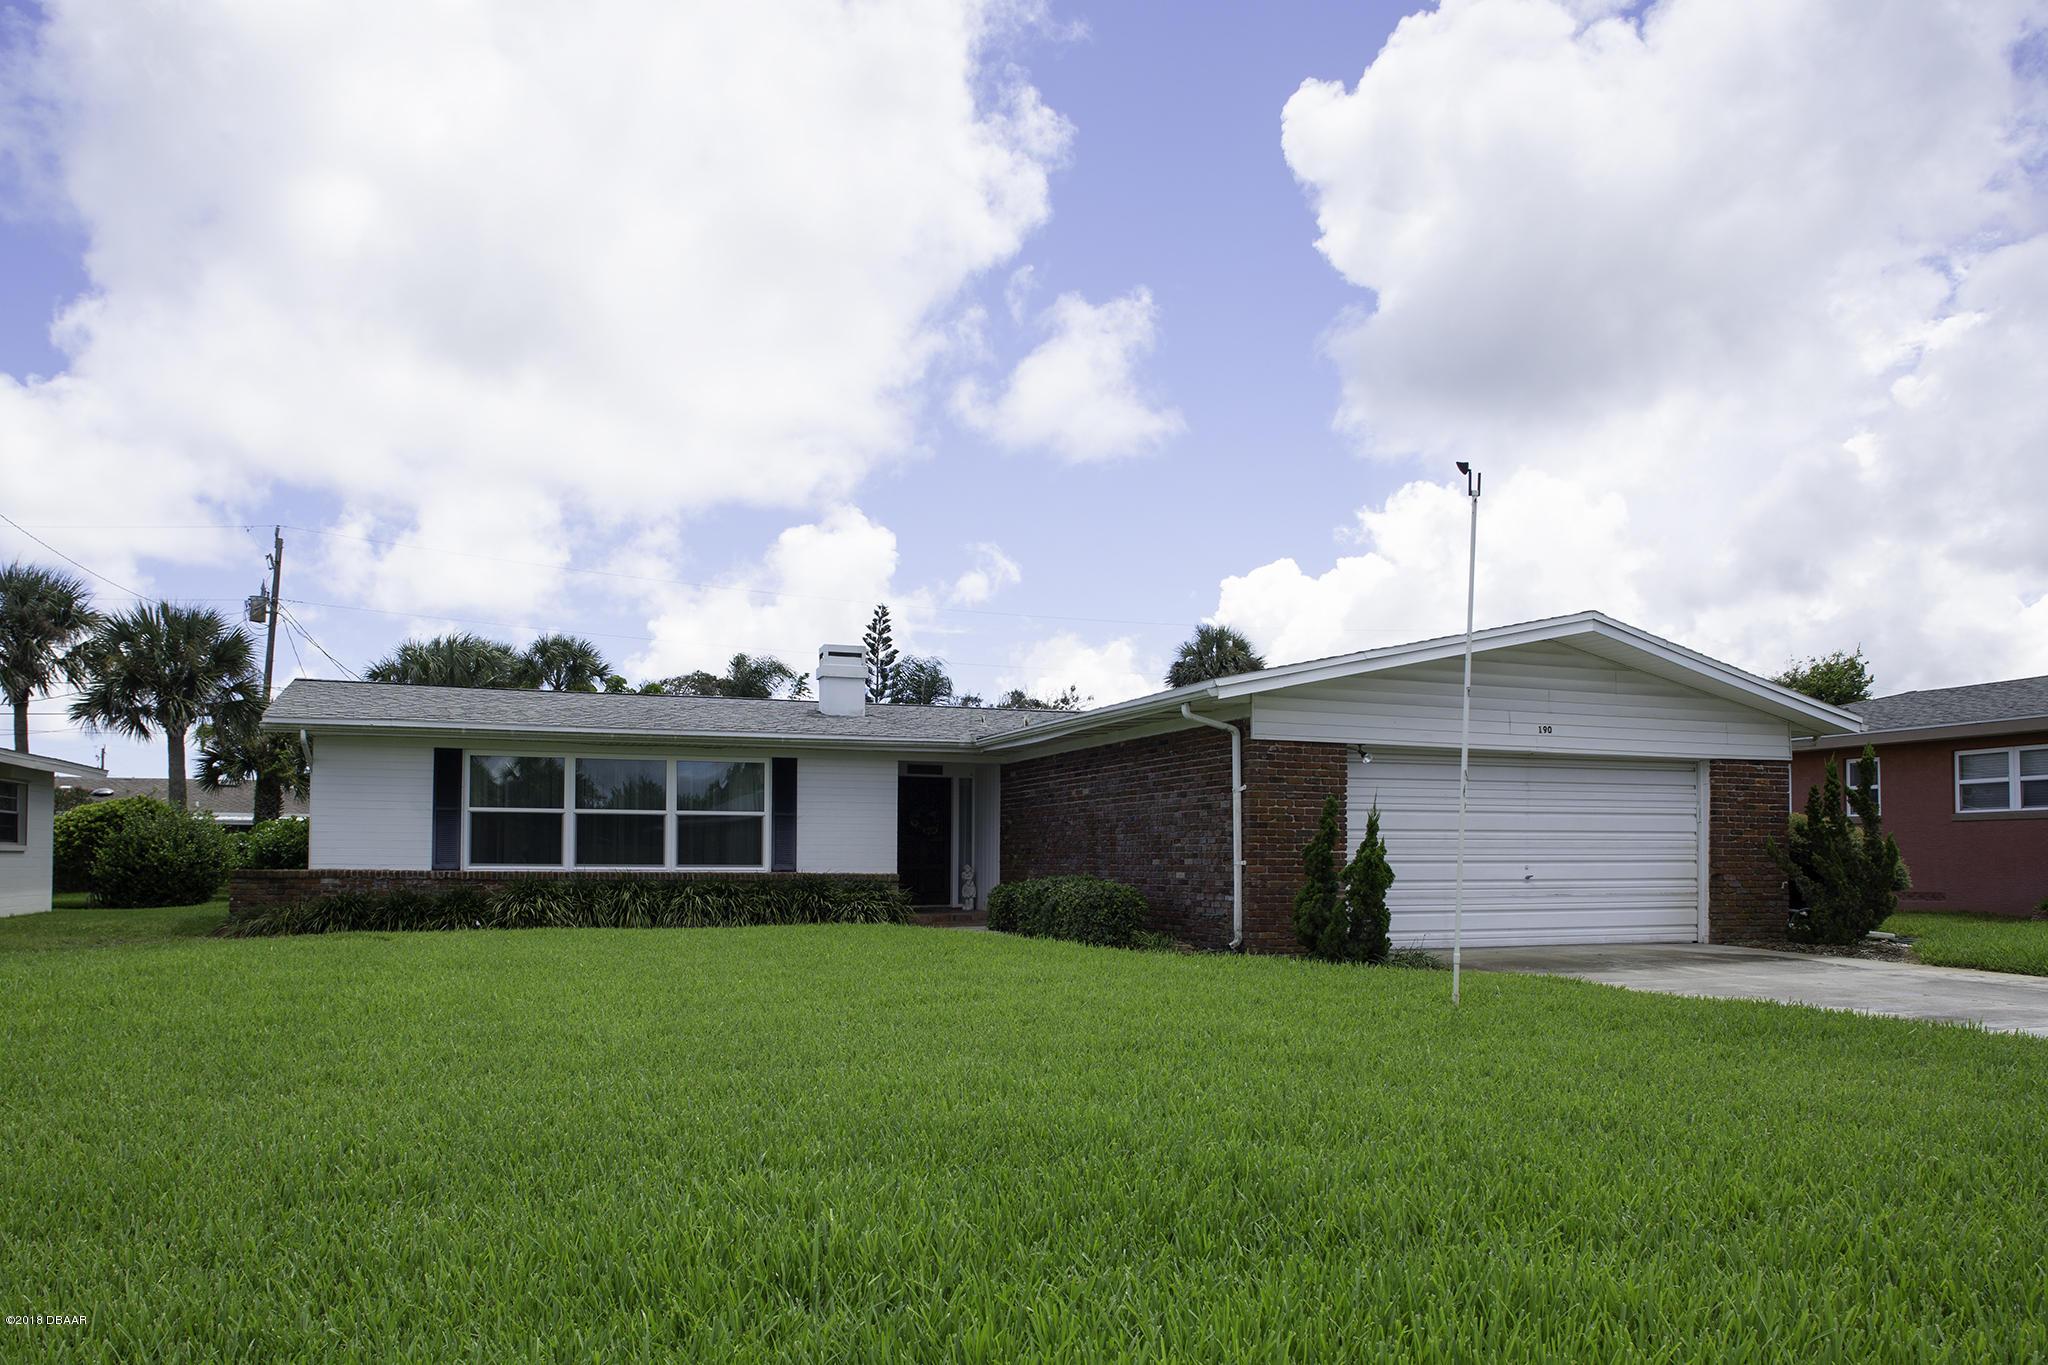 190 Ocean Terrace 32176 - One of Ormond Beach Homes for Sale